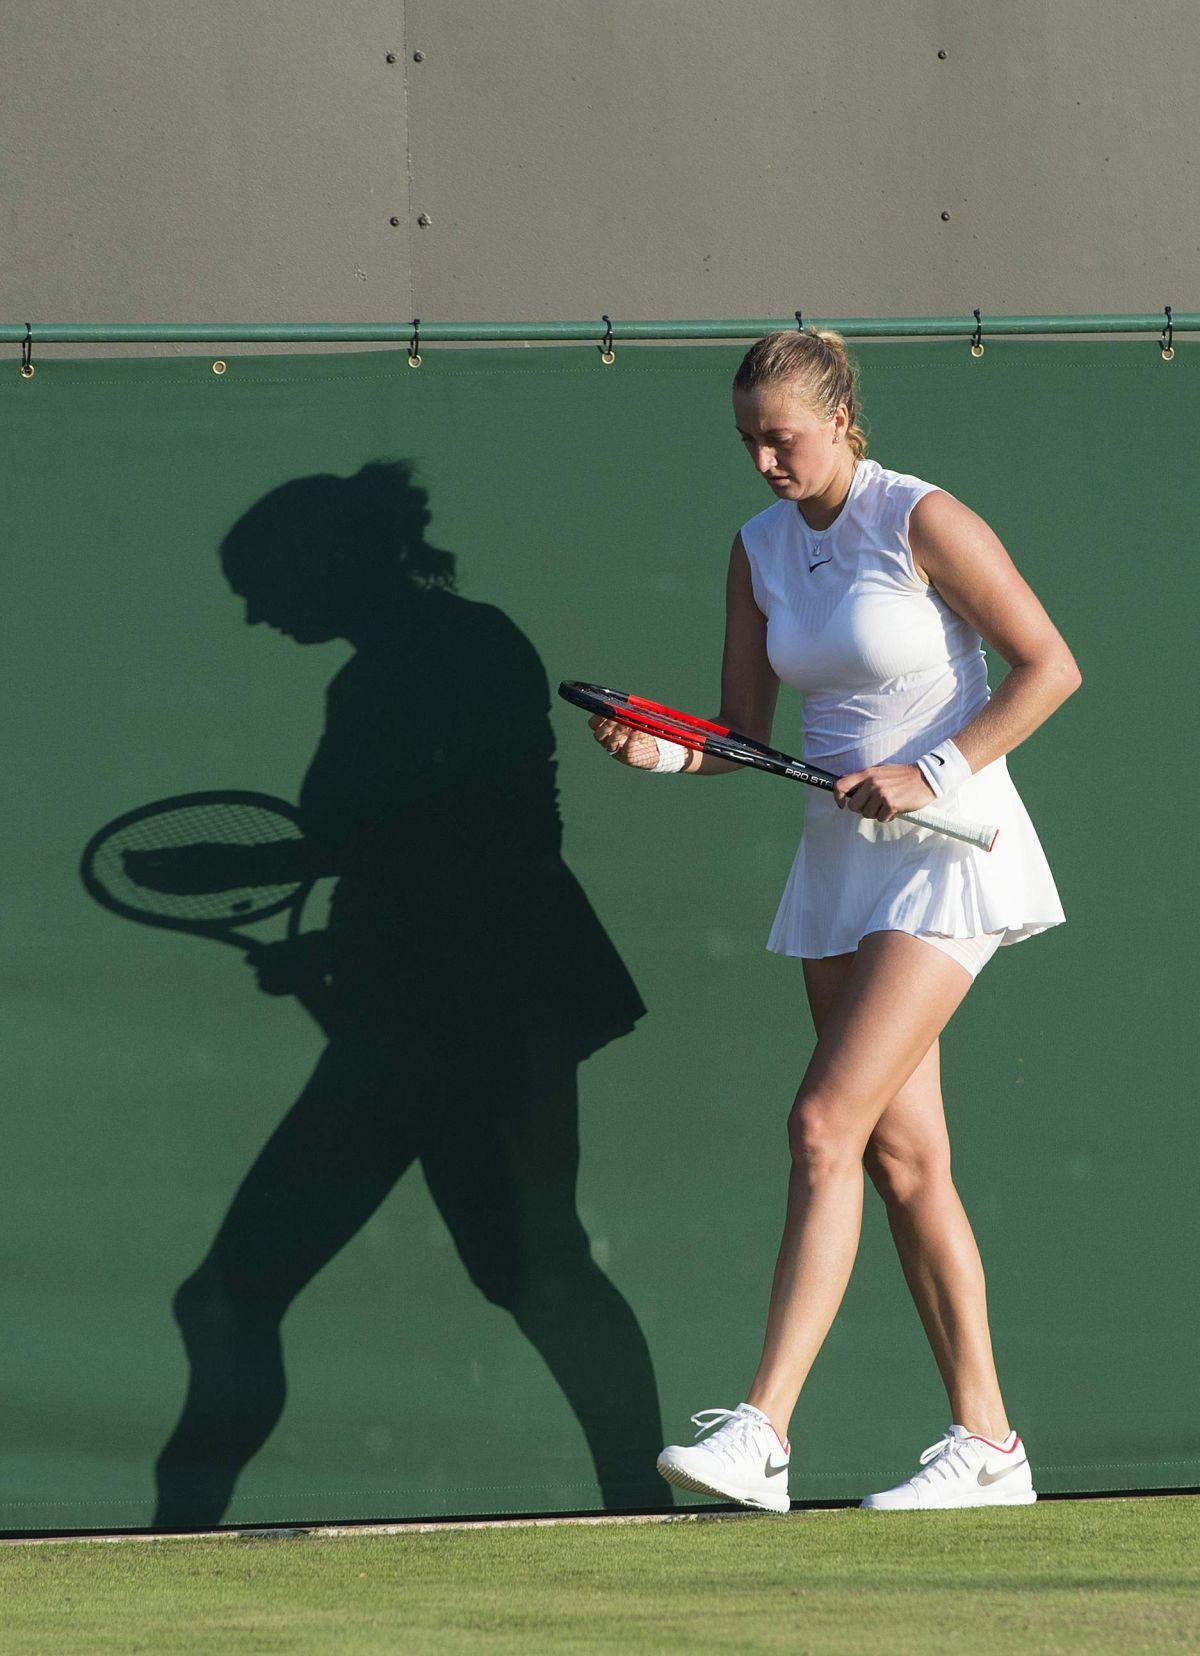 PETRA KVITOVA at Wimbledon Championships 07/04/2017